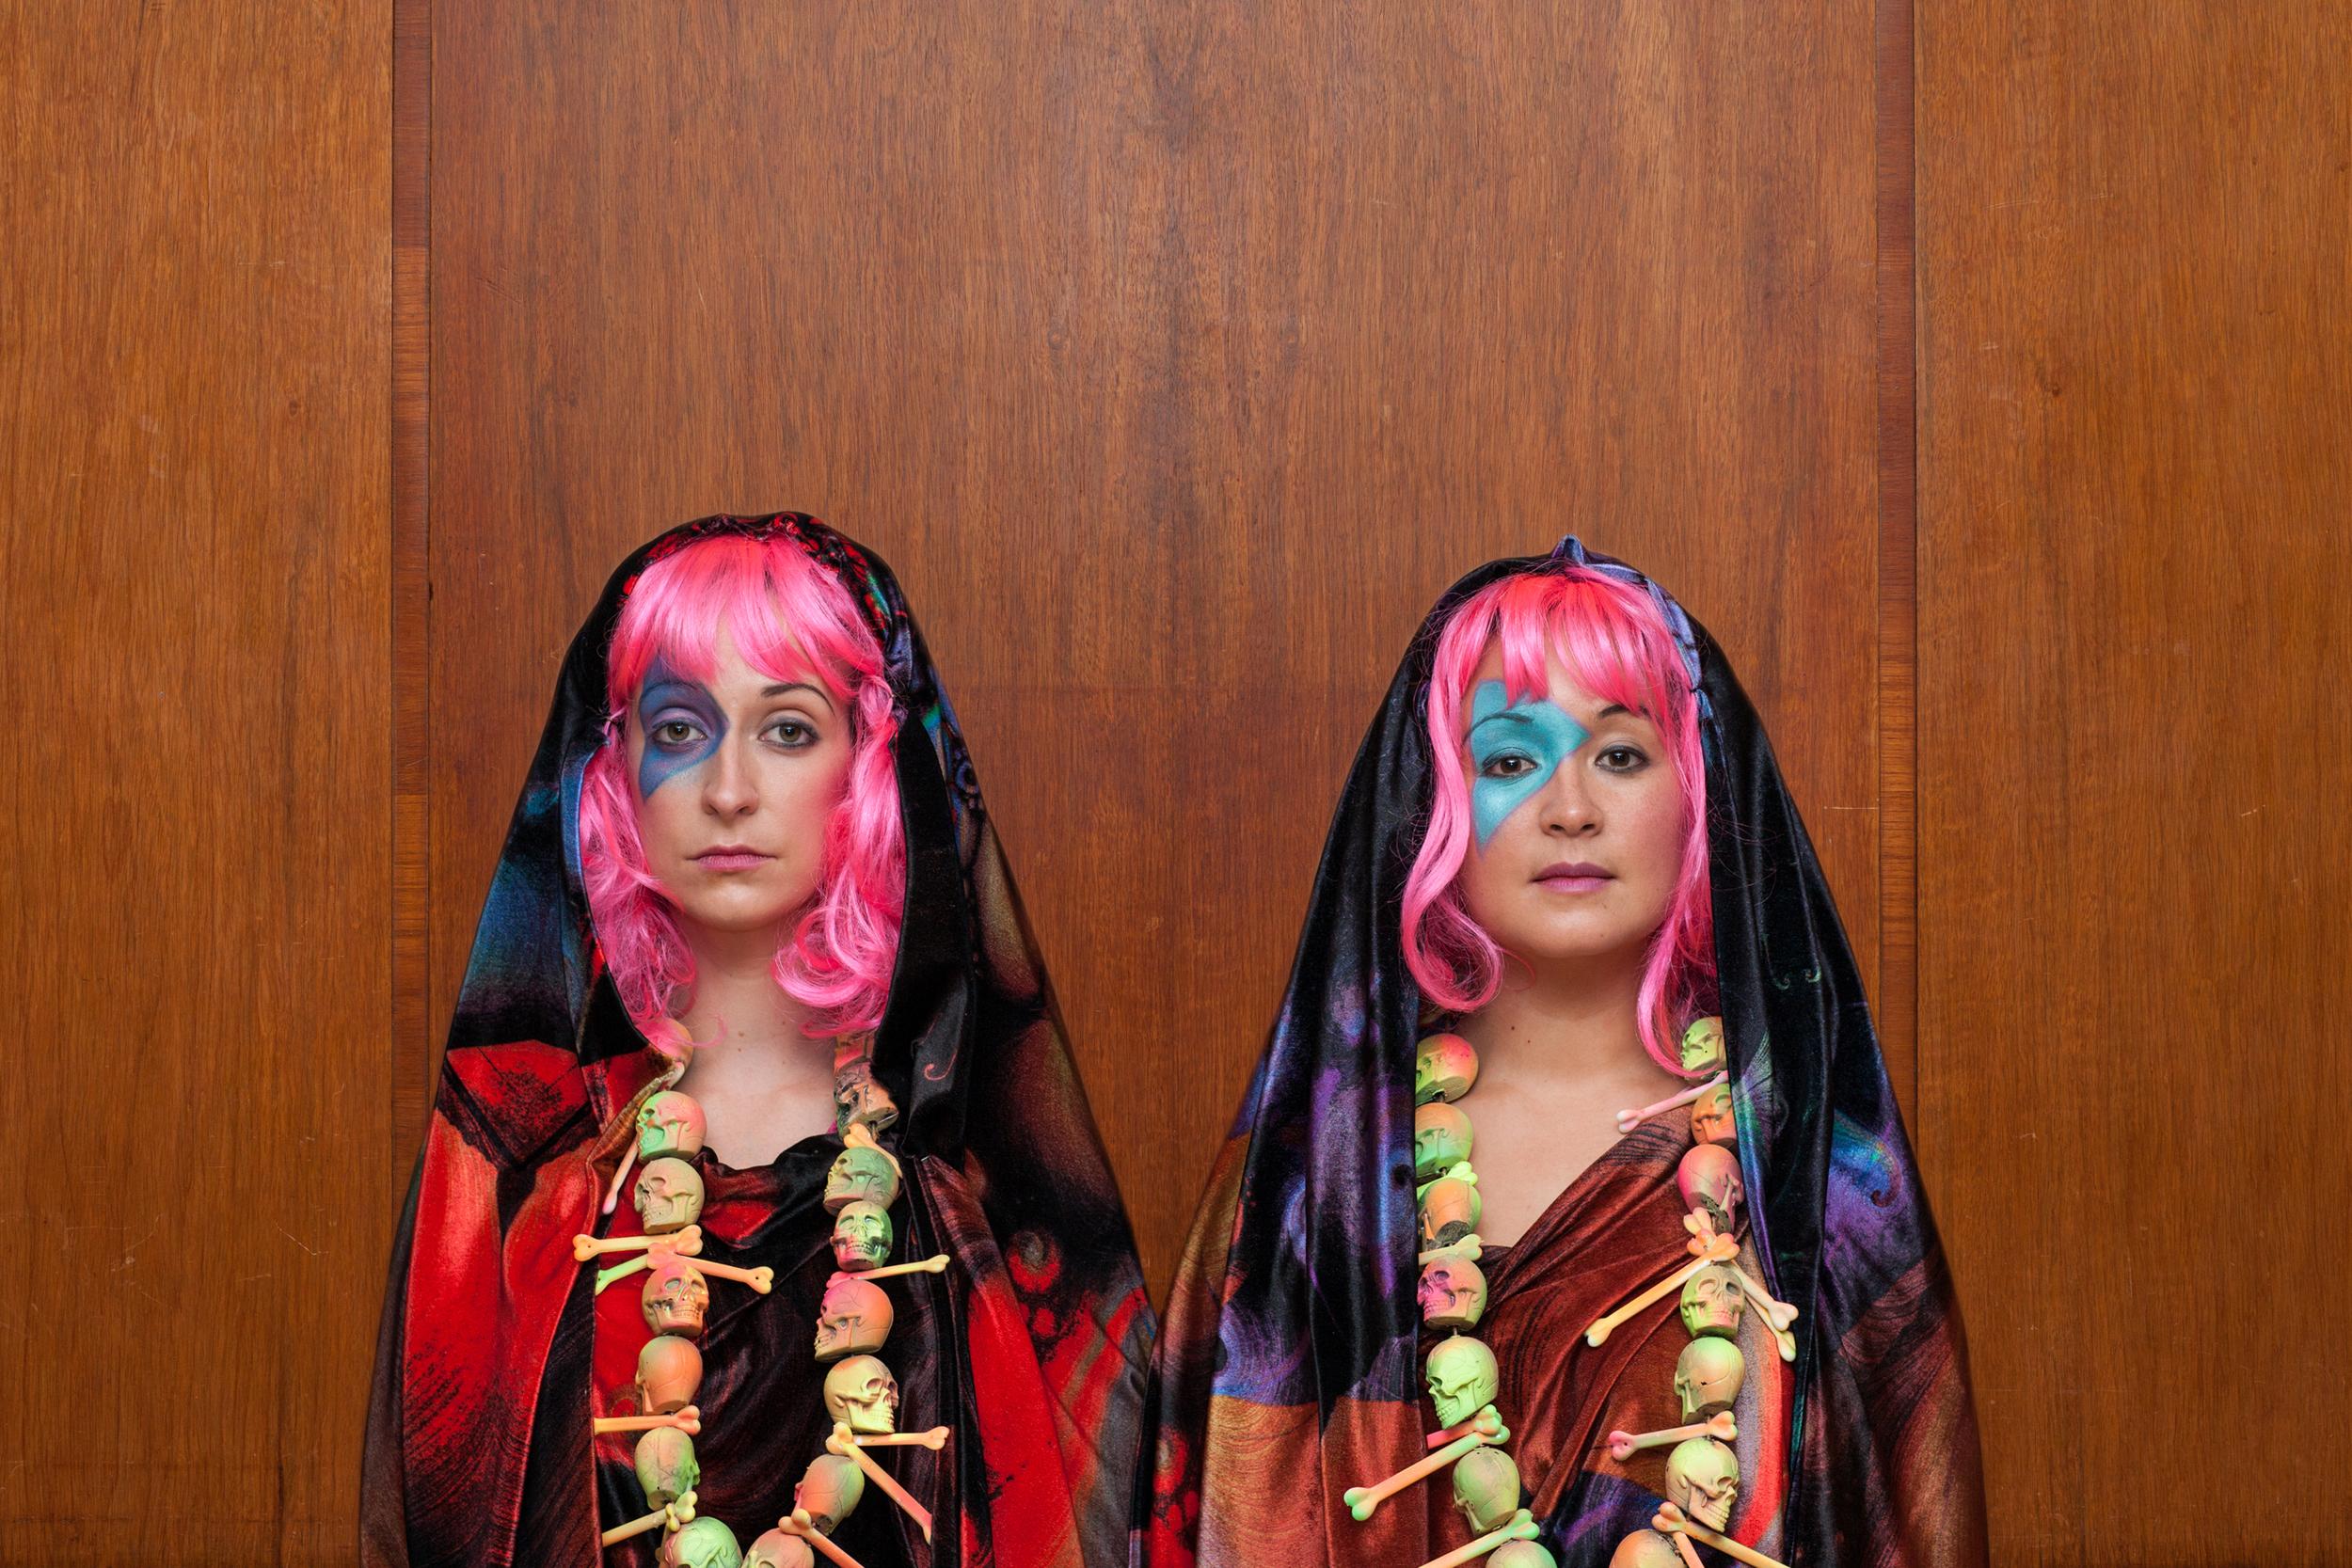 yeti's_demon_dive_bar_psychedelic_nuns_by_steve_gregson_press.jpg